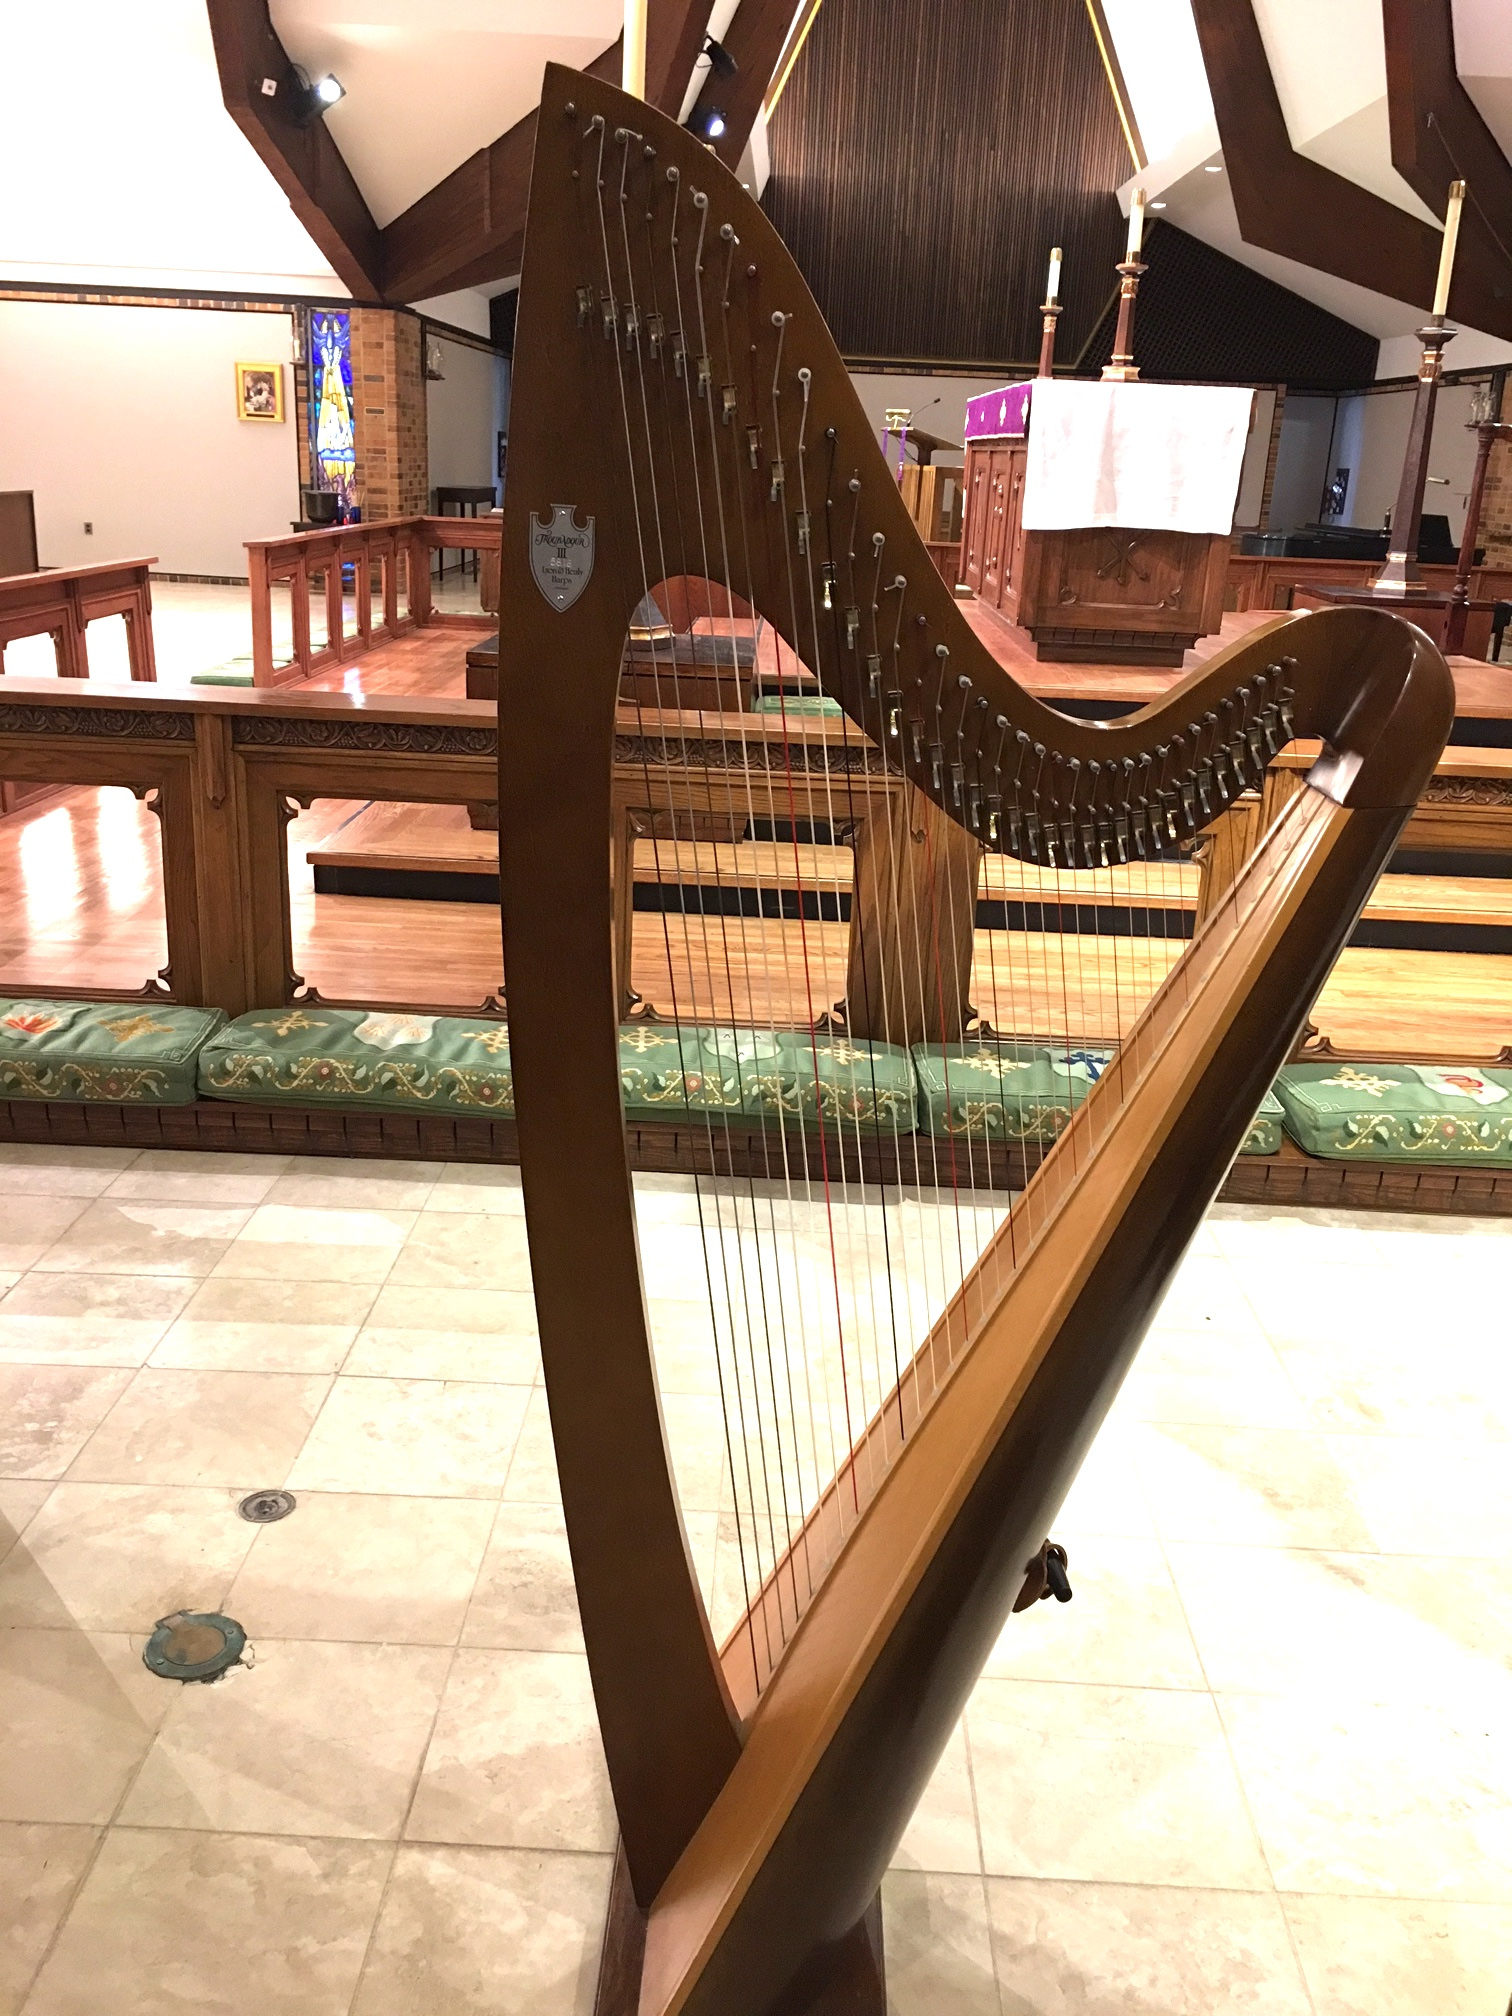 harp at st. marks copy 2.jpeg